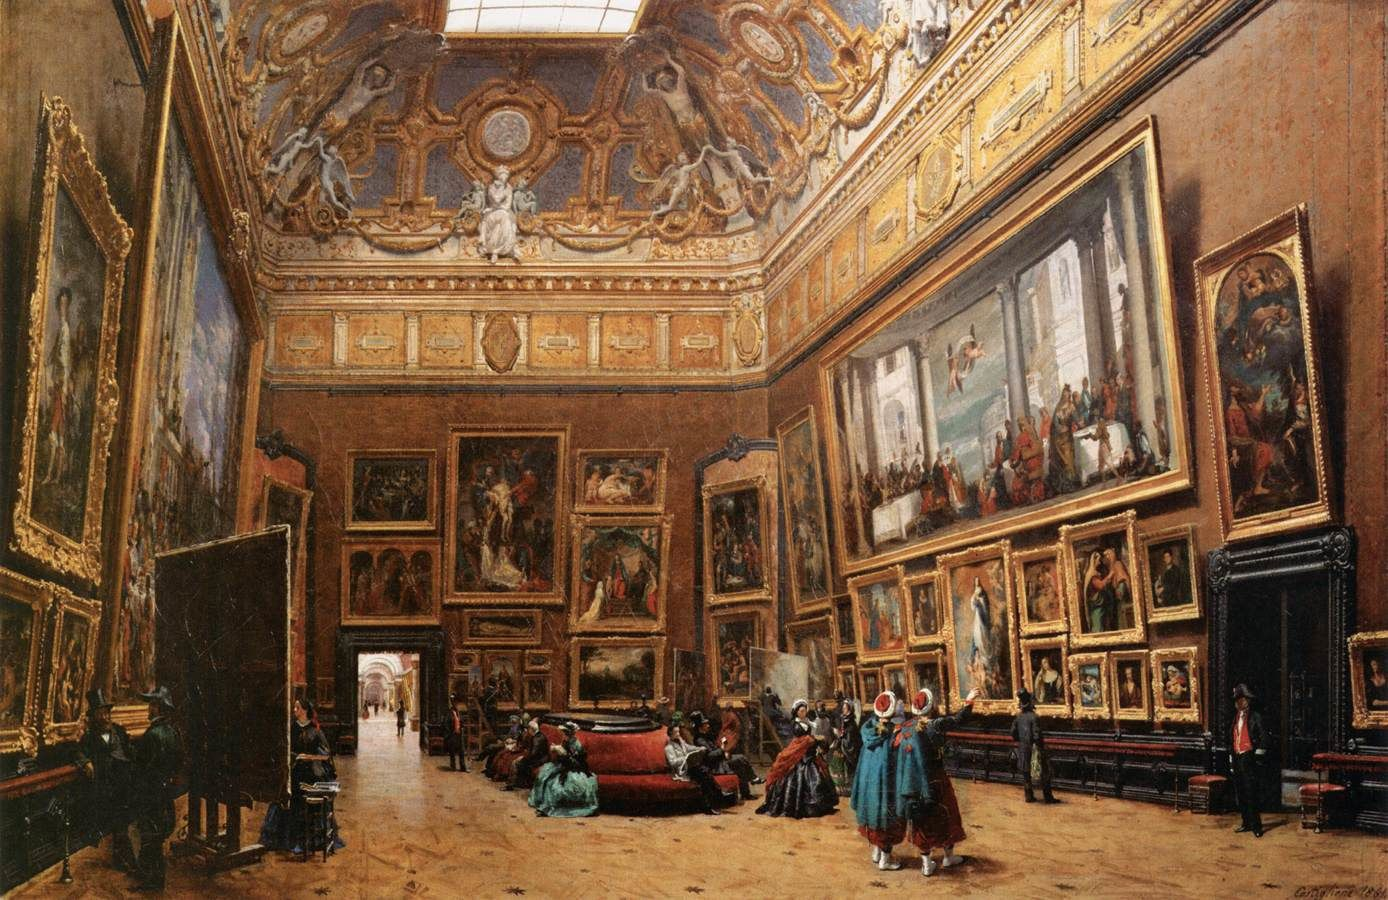 Giuseppe Castiglione (1829-1906) : Vue du Grand Salon Carré, au Musée du Louvre, salon de 1861, 69X103, Musée du Louvre.